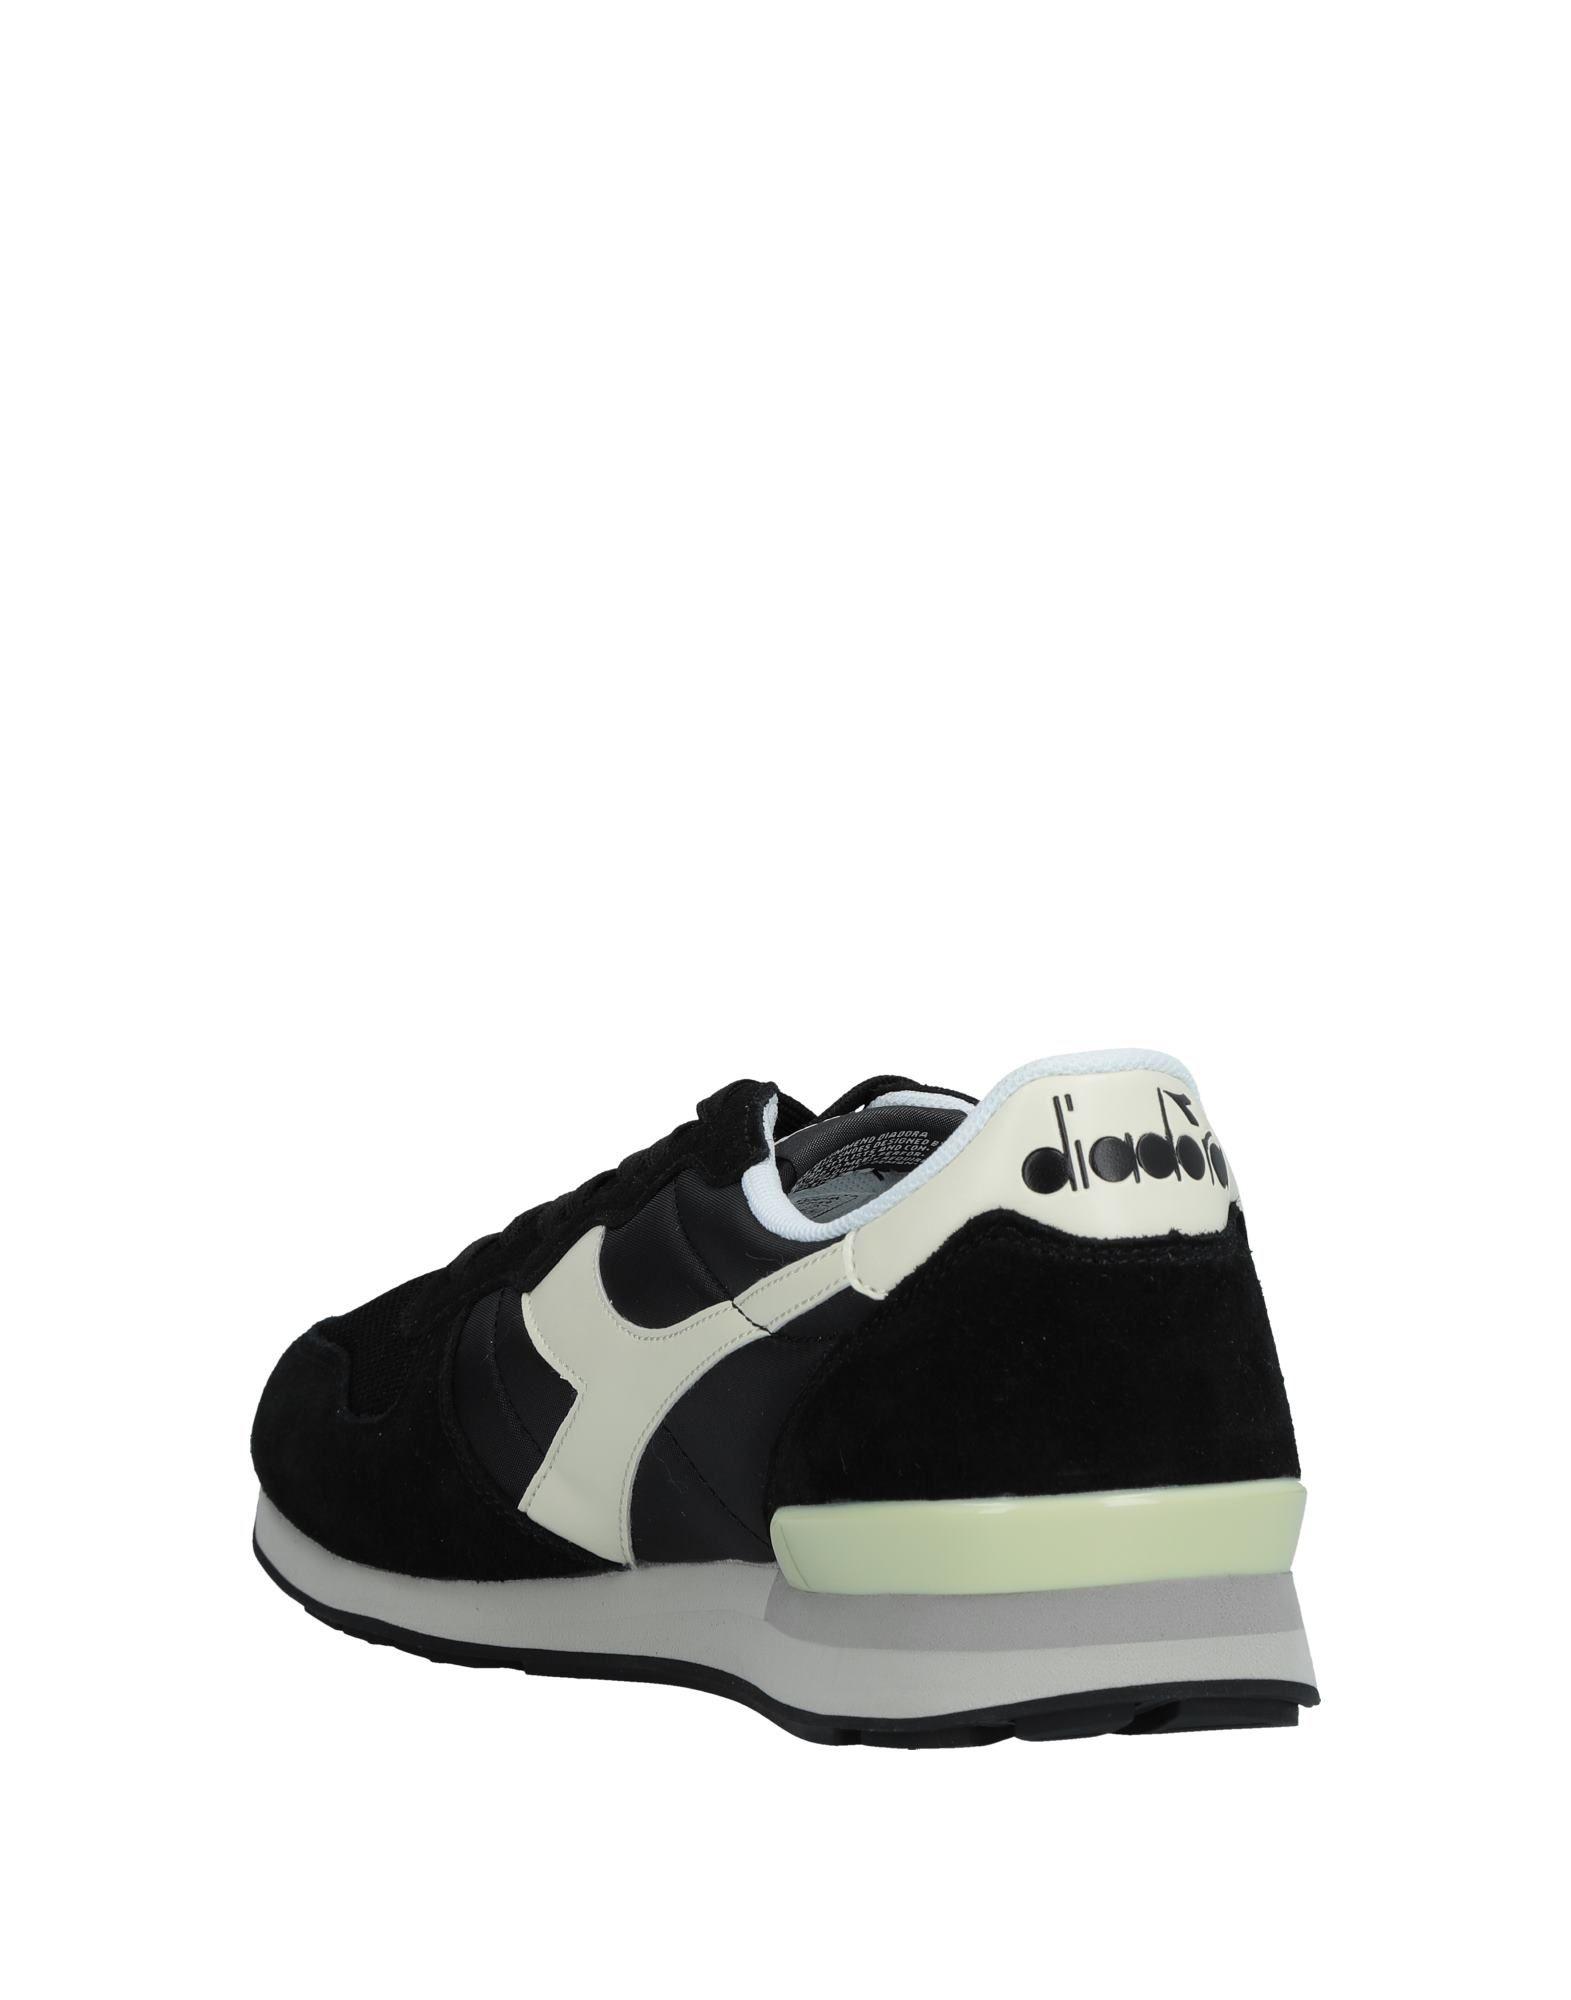 Rabatt Herren echte Schuhe Diadora Sneakers Herren Rabatt  11519301DQ 20930e